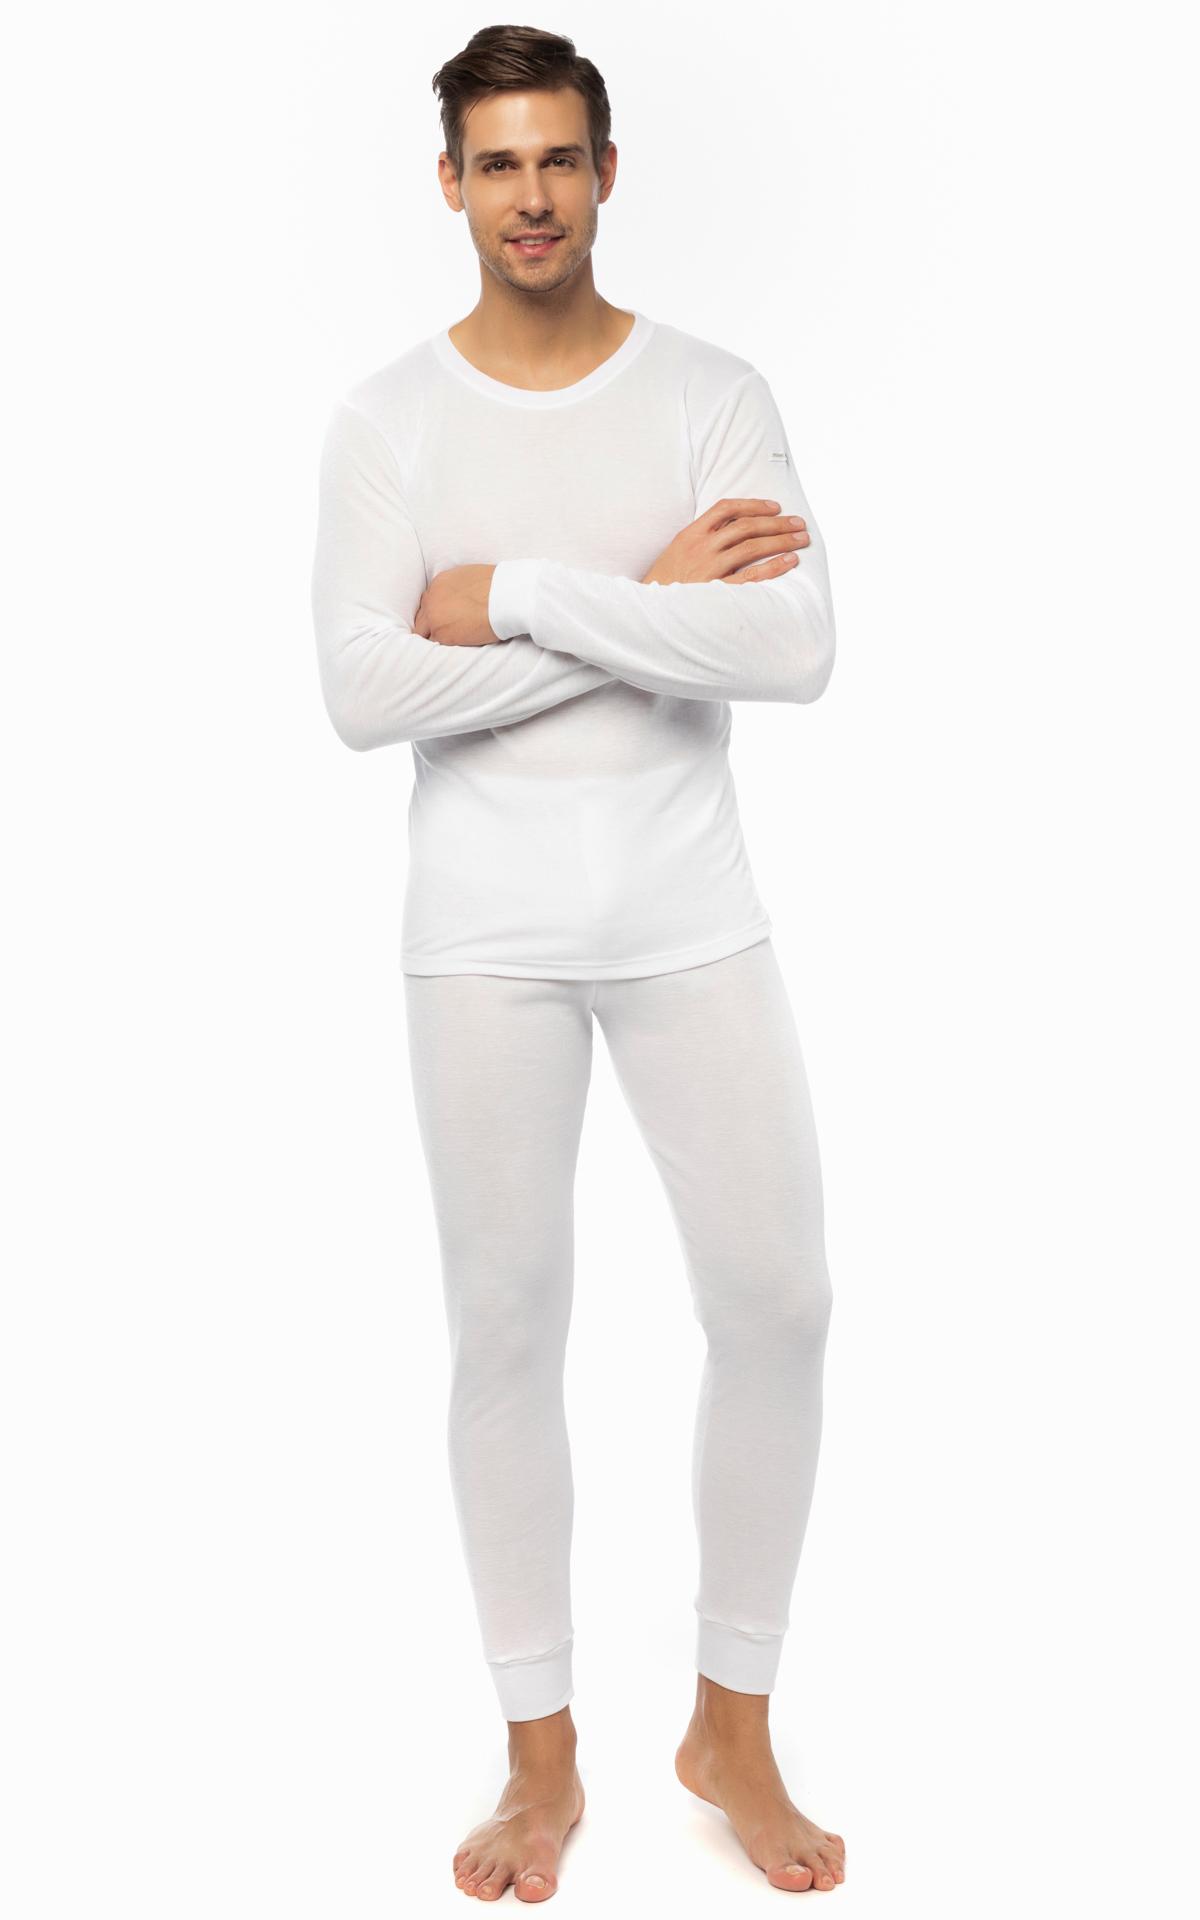 bf178179589b Ανδρας Εσώρουχα Ισοθερμικά Μπλούζα Μακρύ Μανίκι Thermal